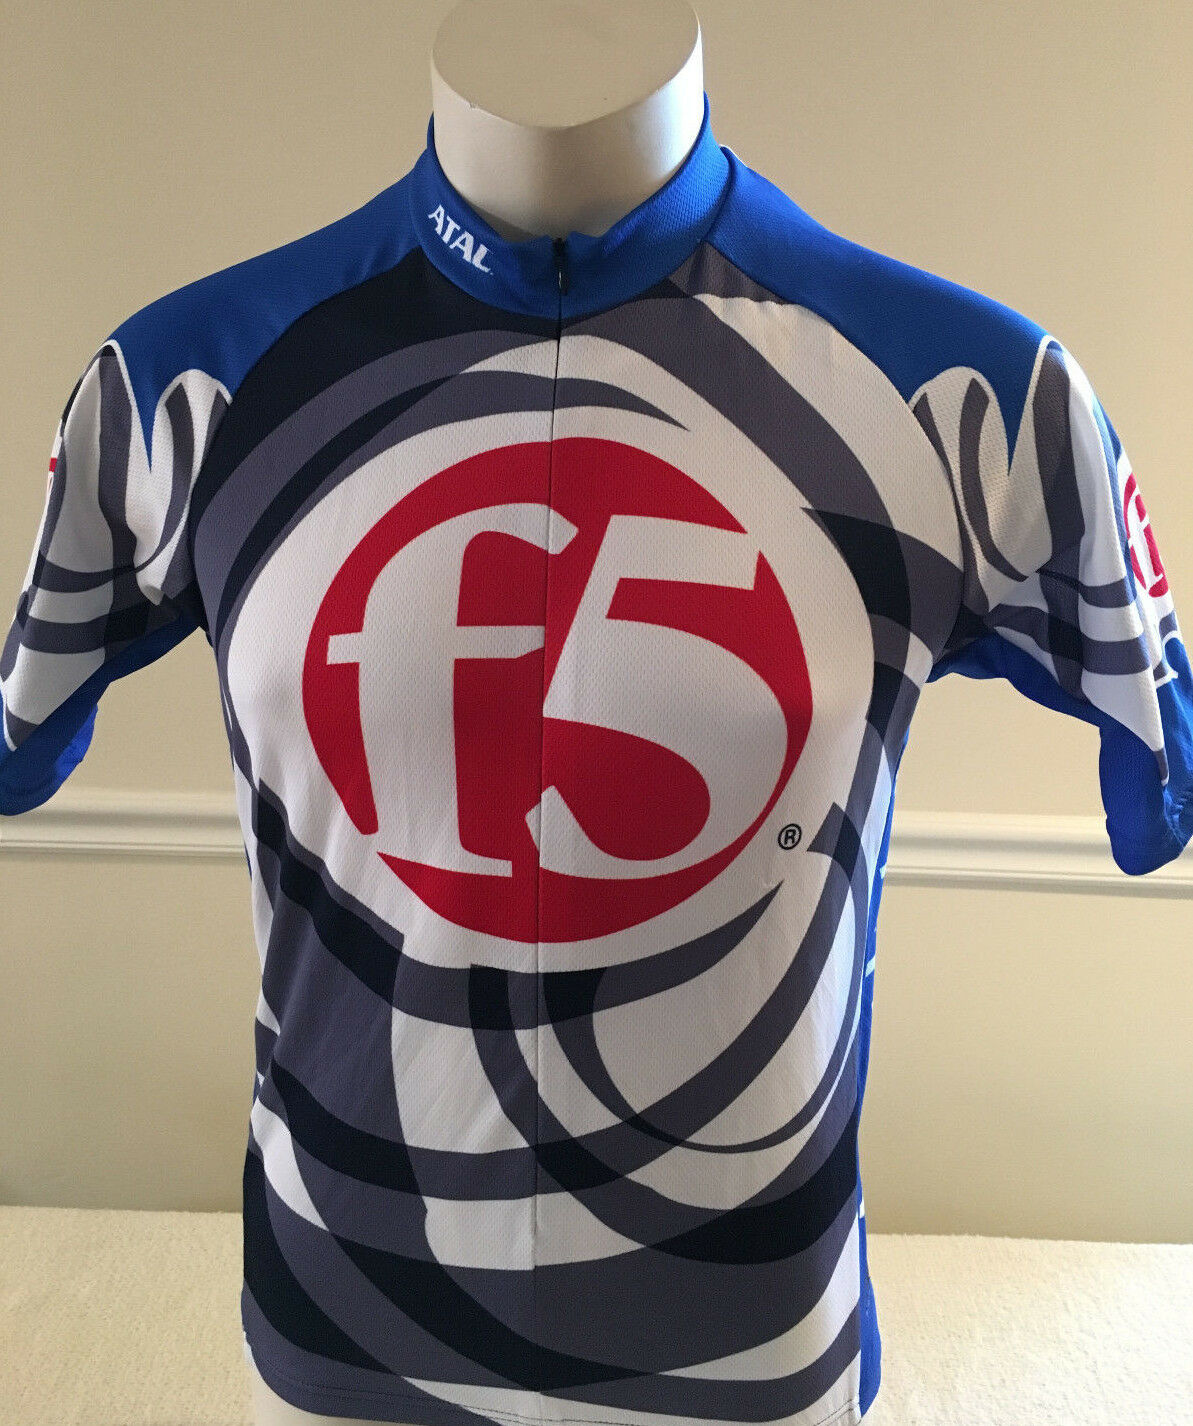 F5 Networks bluee Cycling Jersey Atac Sportswear Men's Size Small